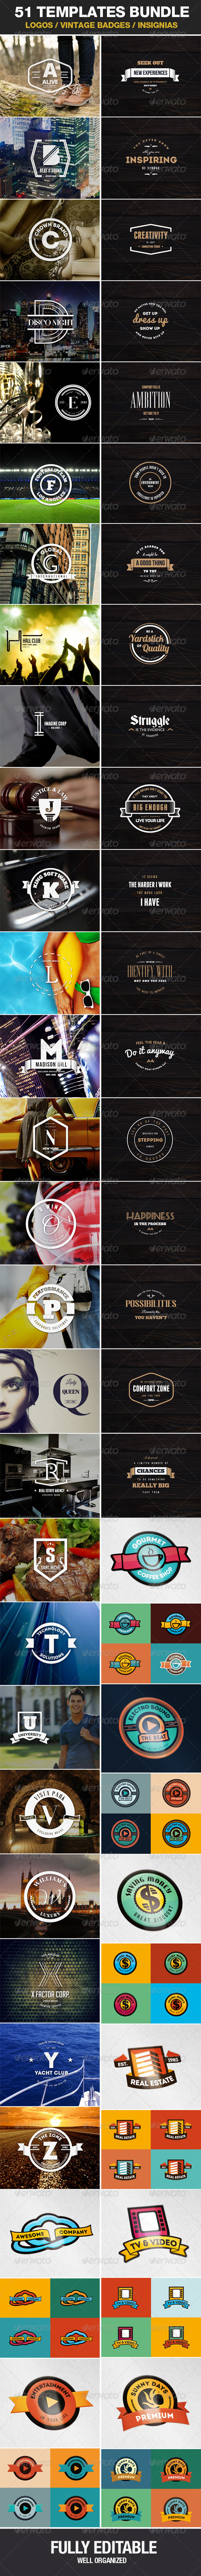 GraphicRiver 51 Templates Logos Vintage Badges Insignias 7740570